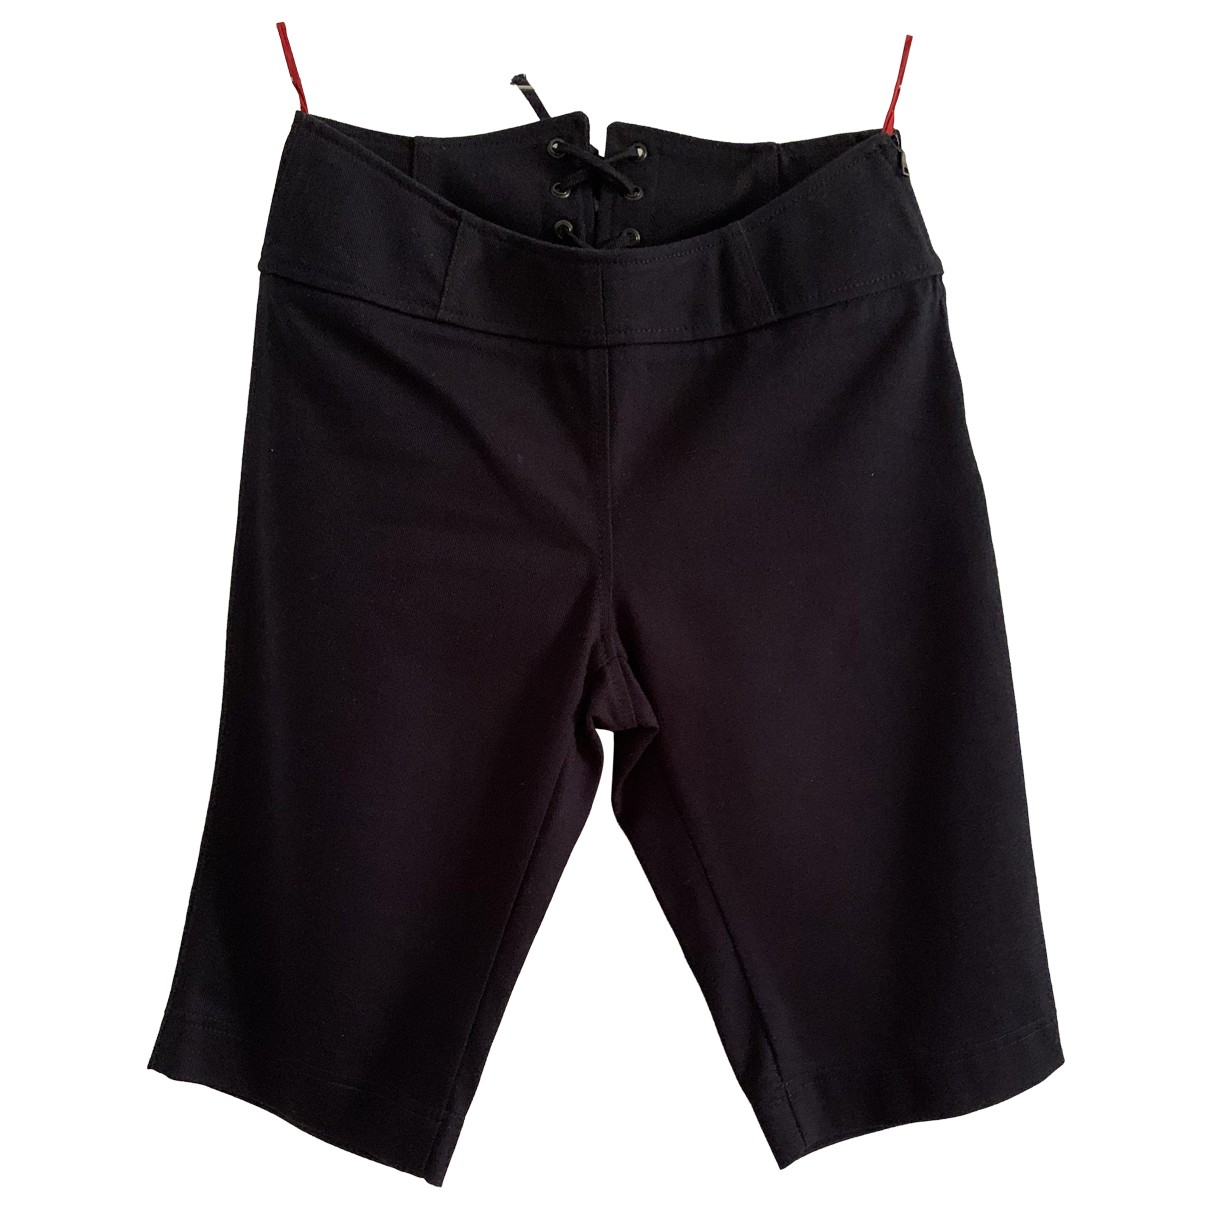 Prada \N Shorts in  Blau Baumwolle